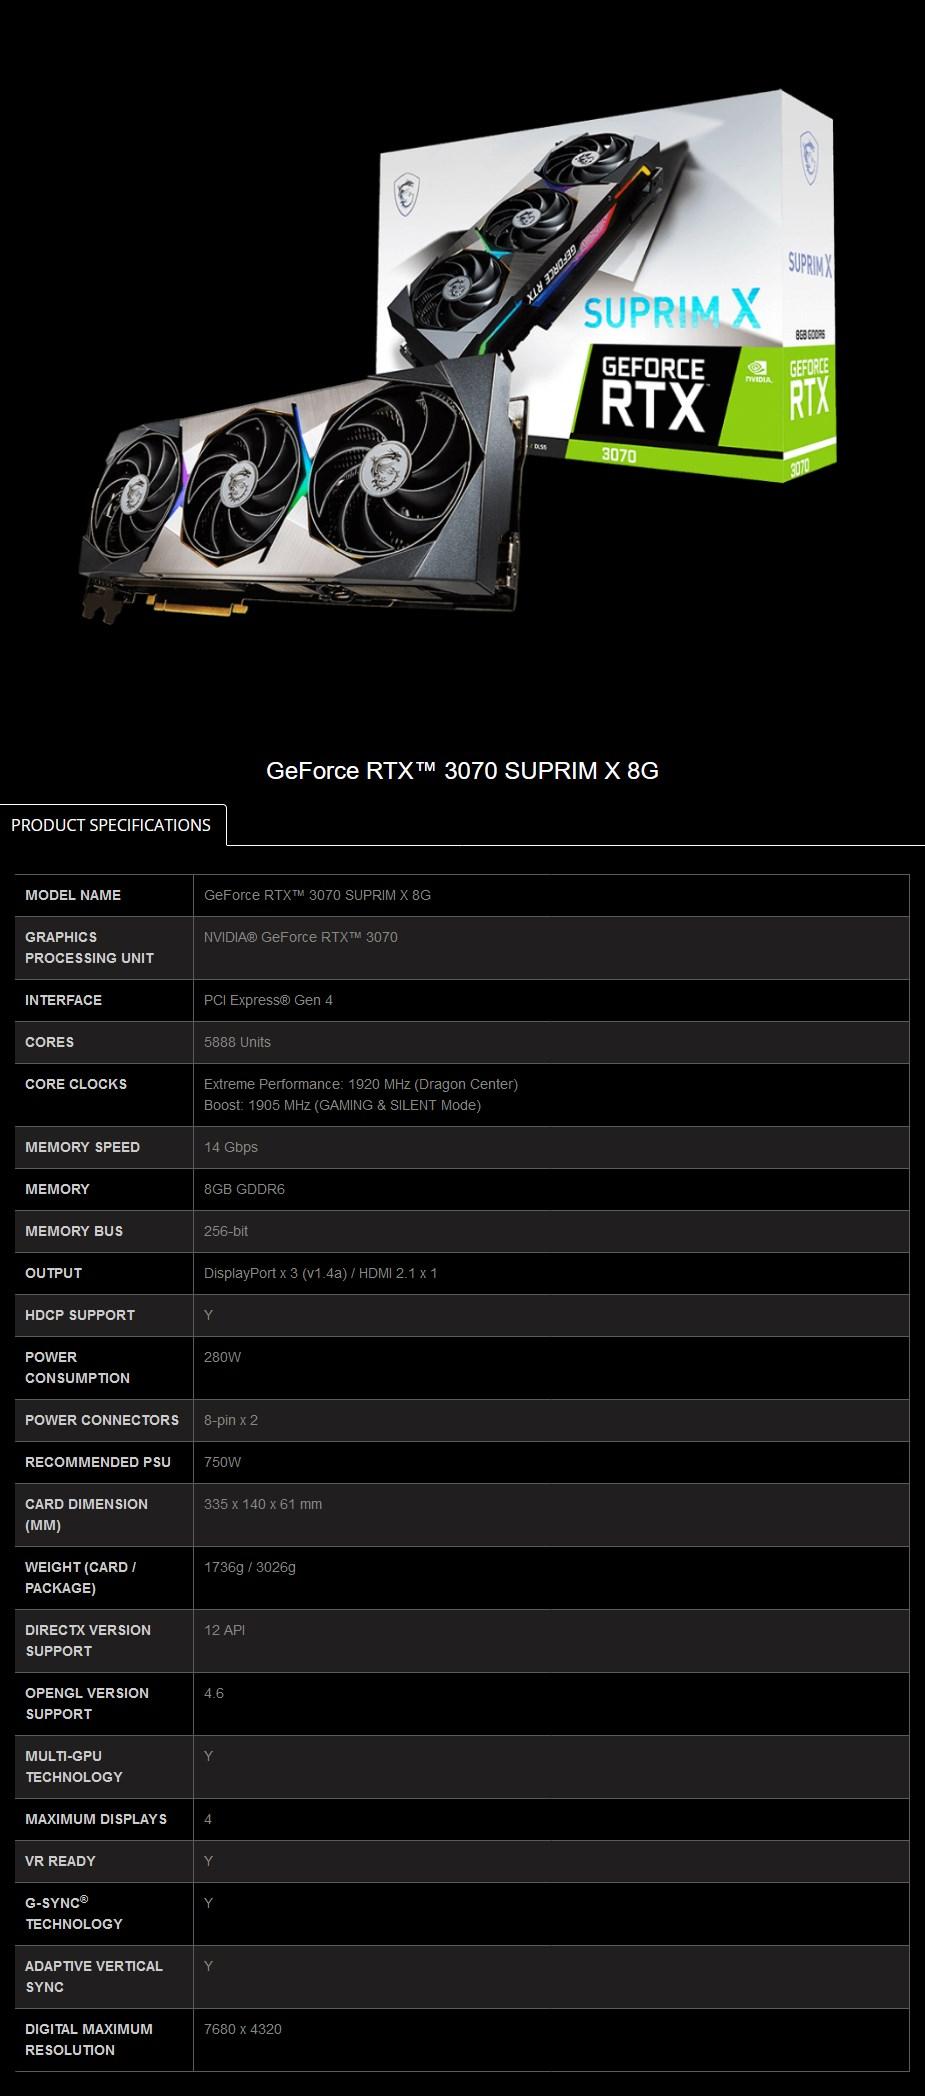 MSI GeForce RTX 3070 SUPRIM X 8GB Video Card - Overview 2